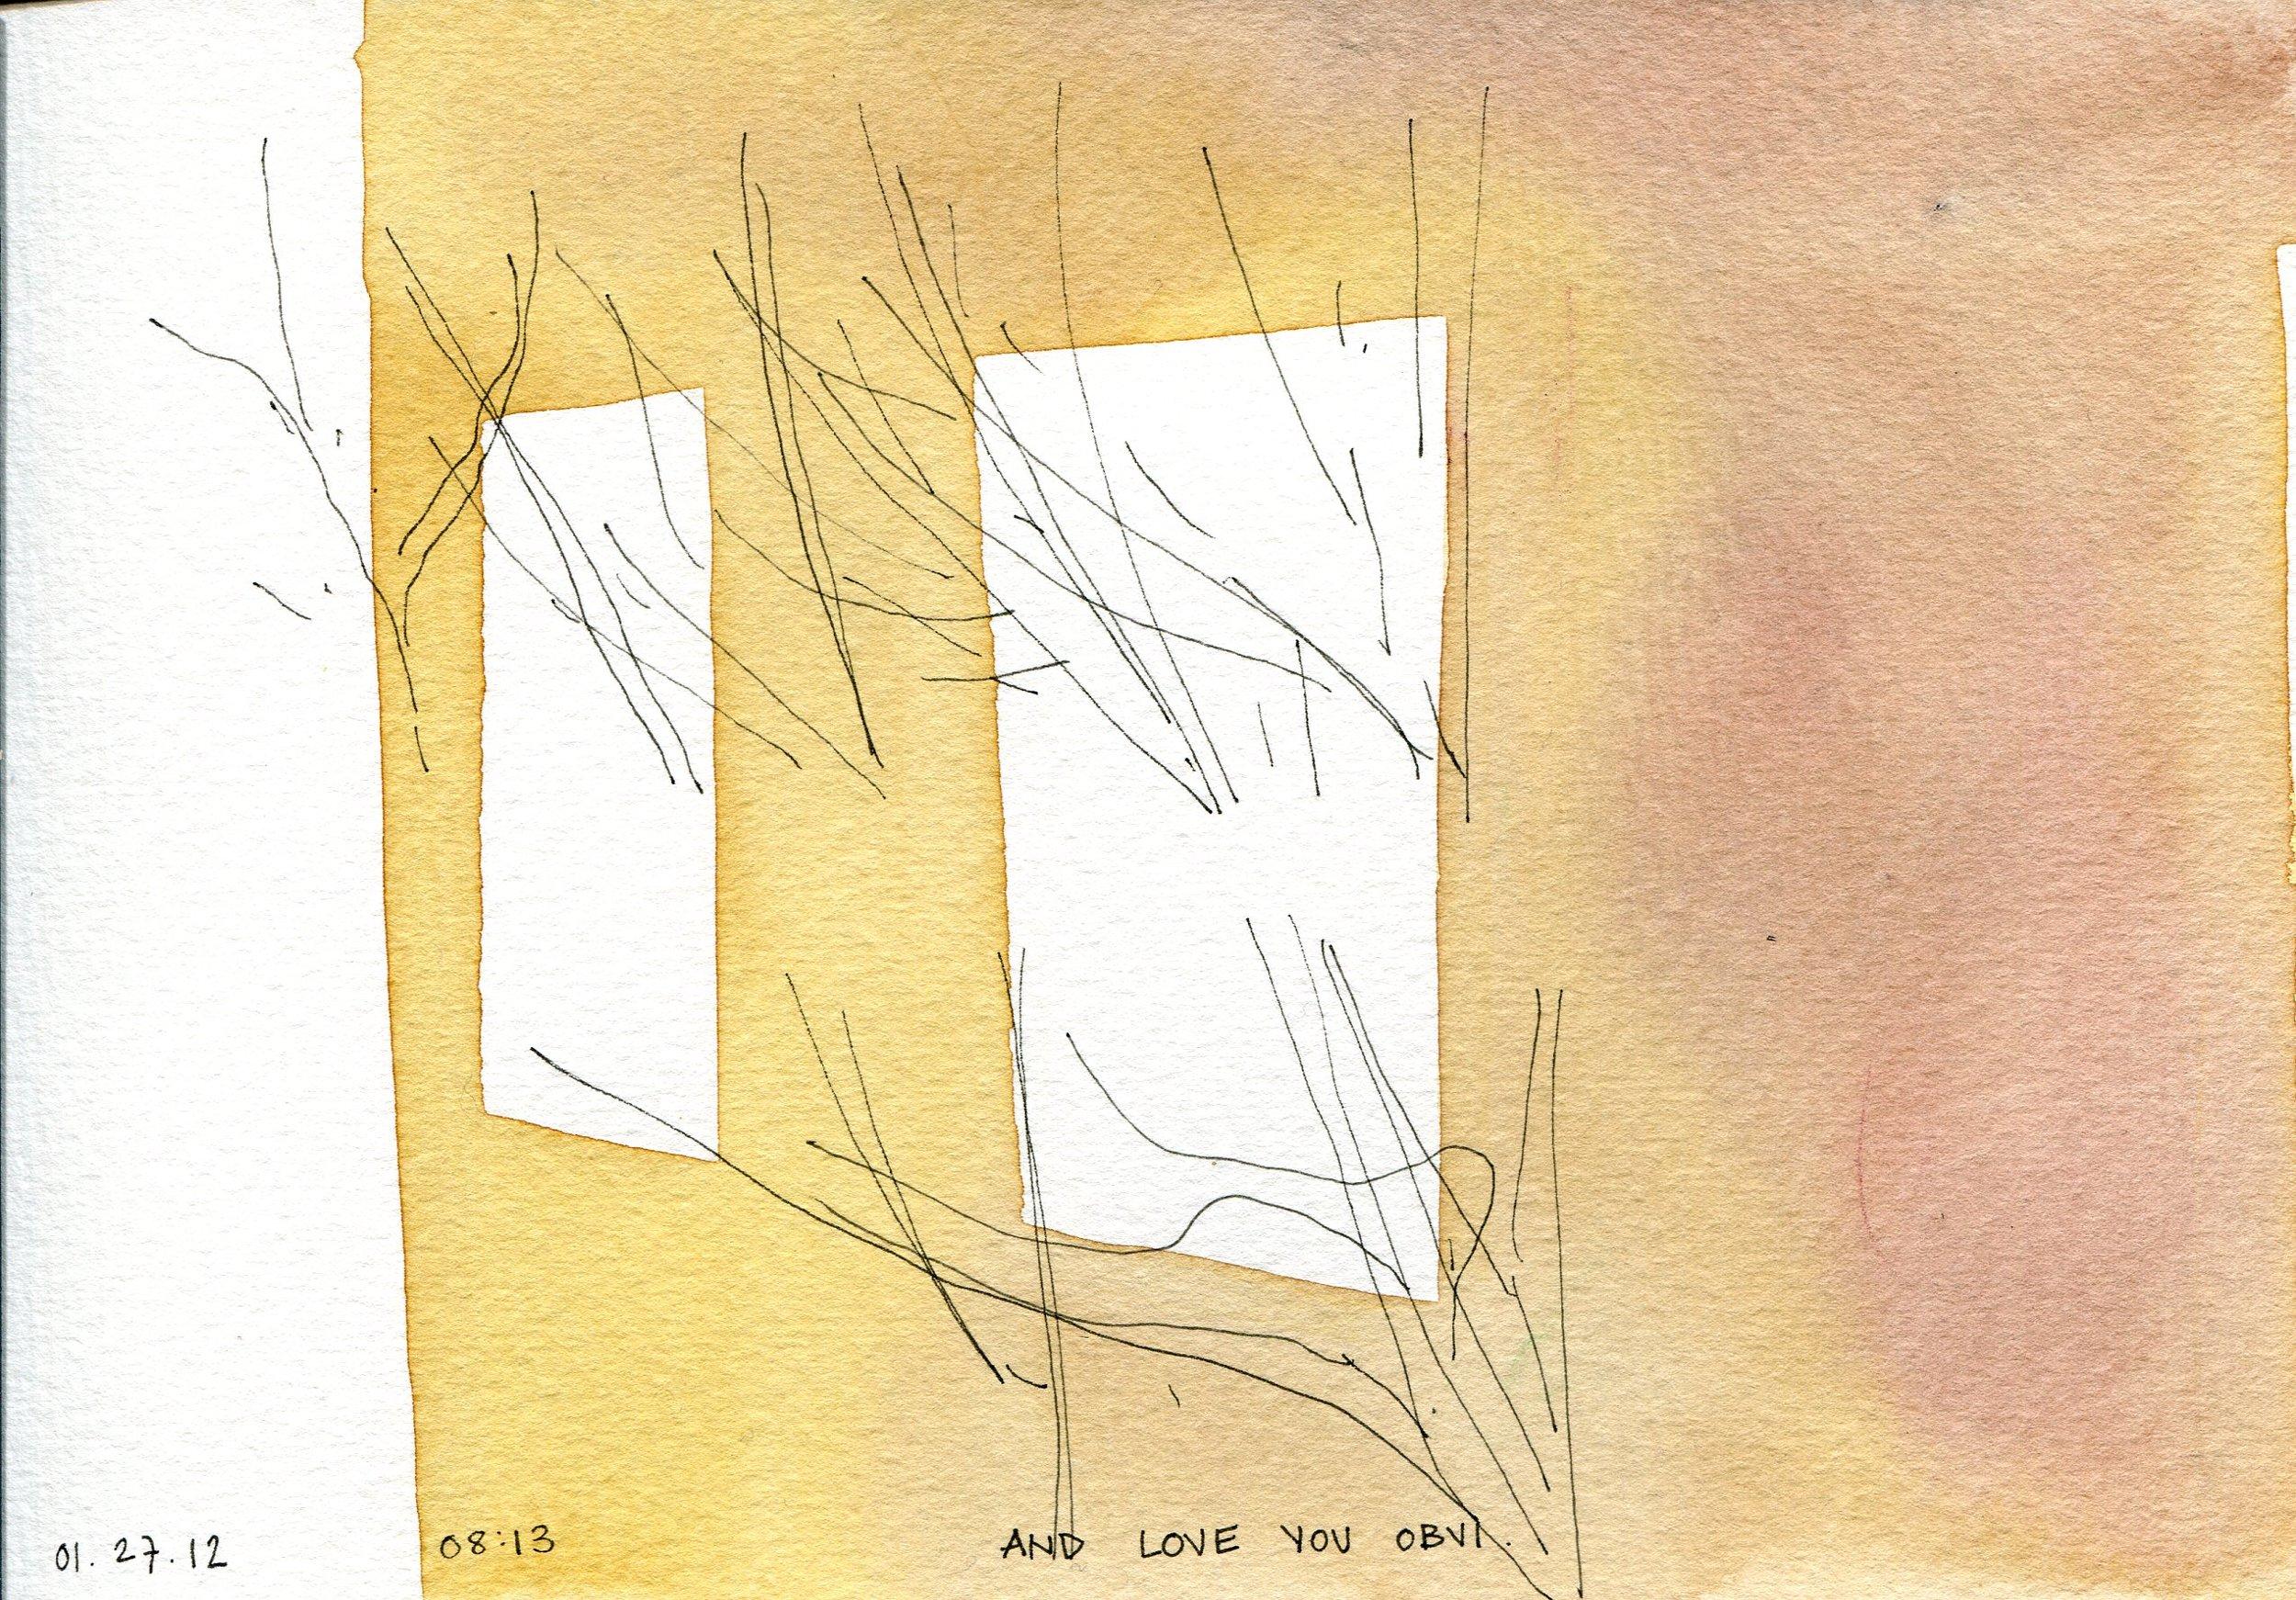 2012-01-28 drawing007.jpg